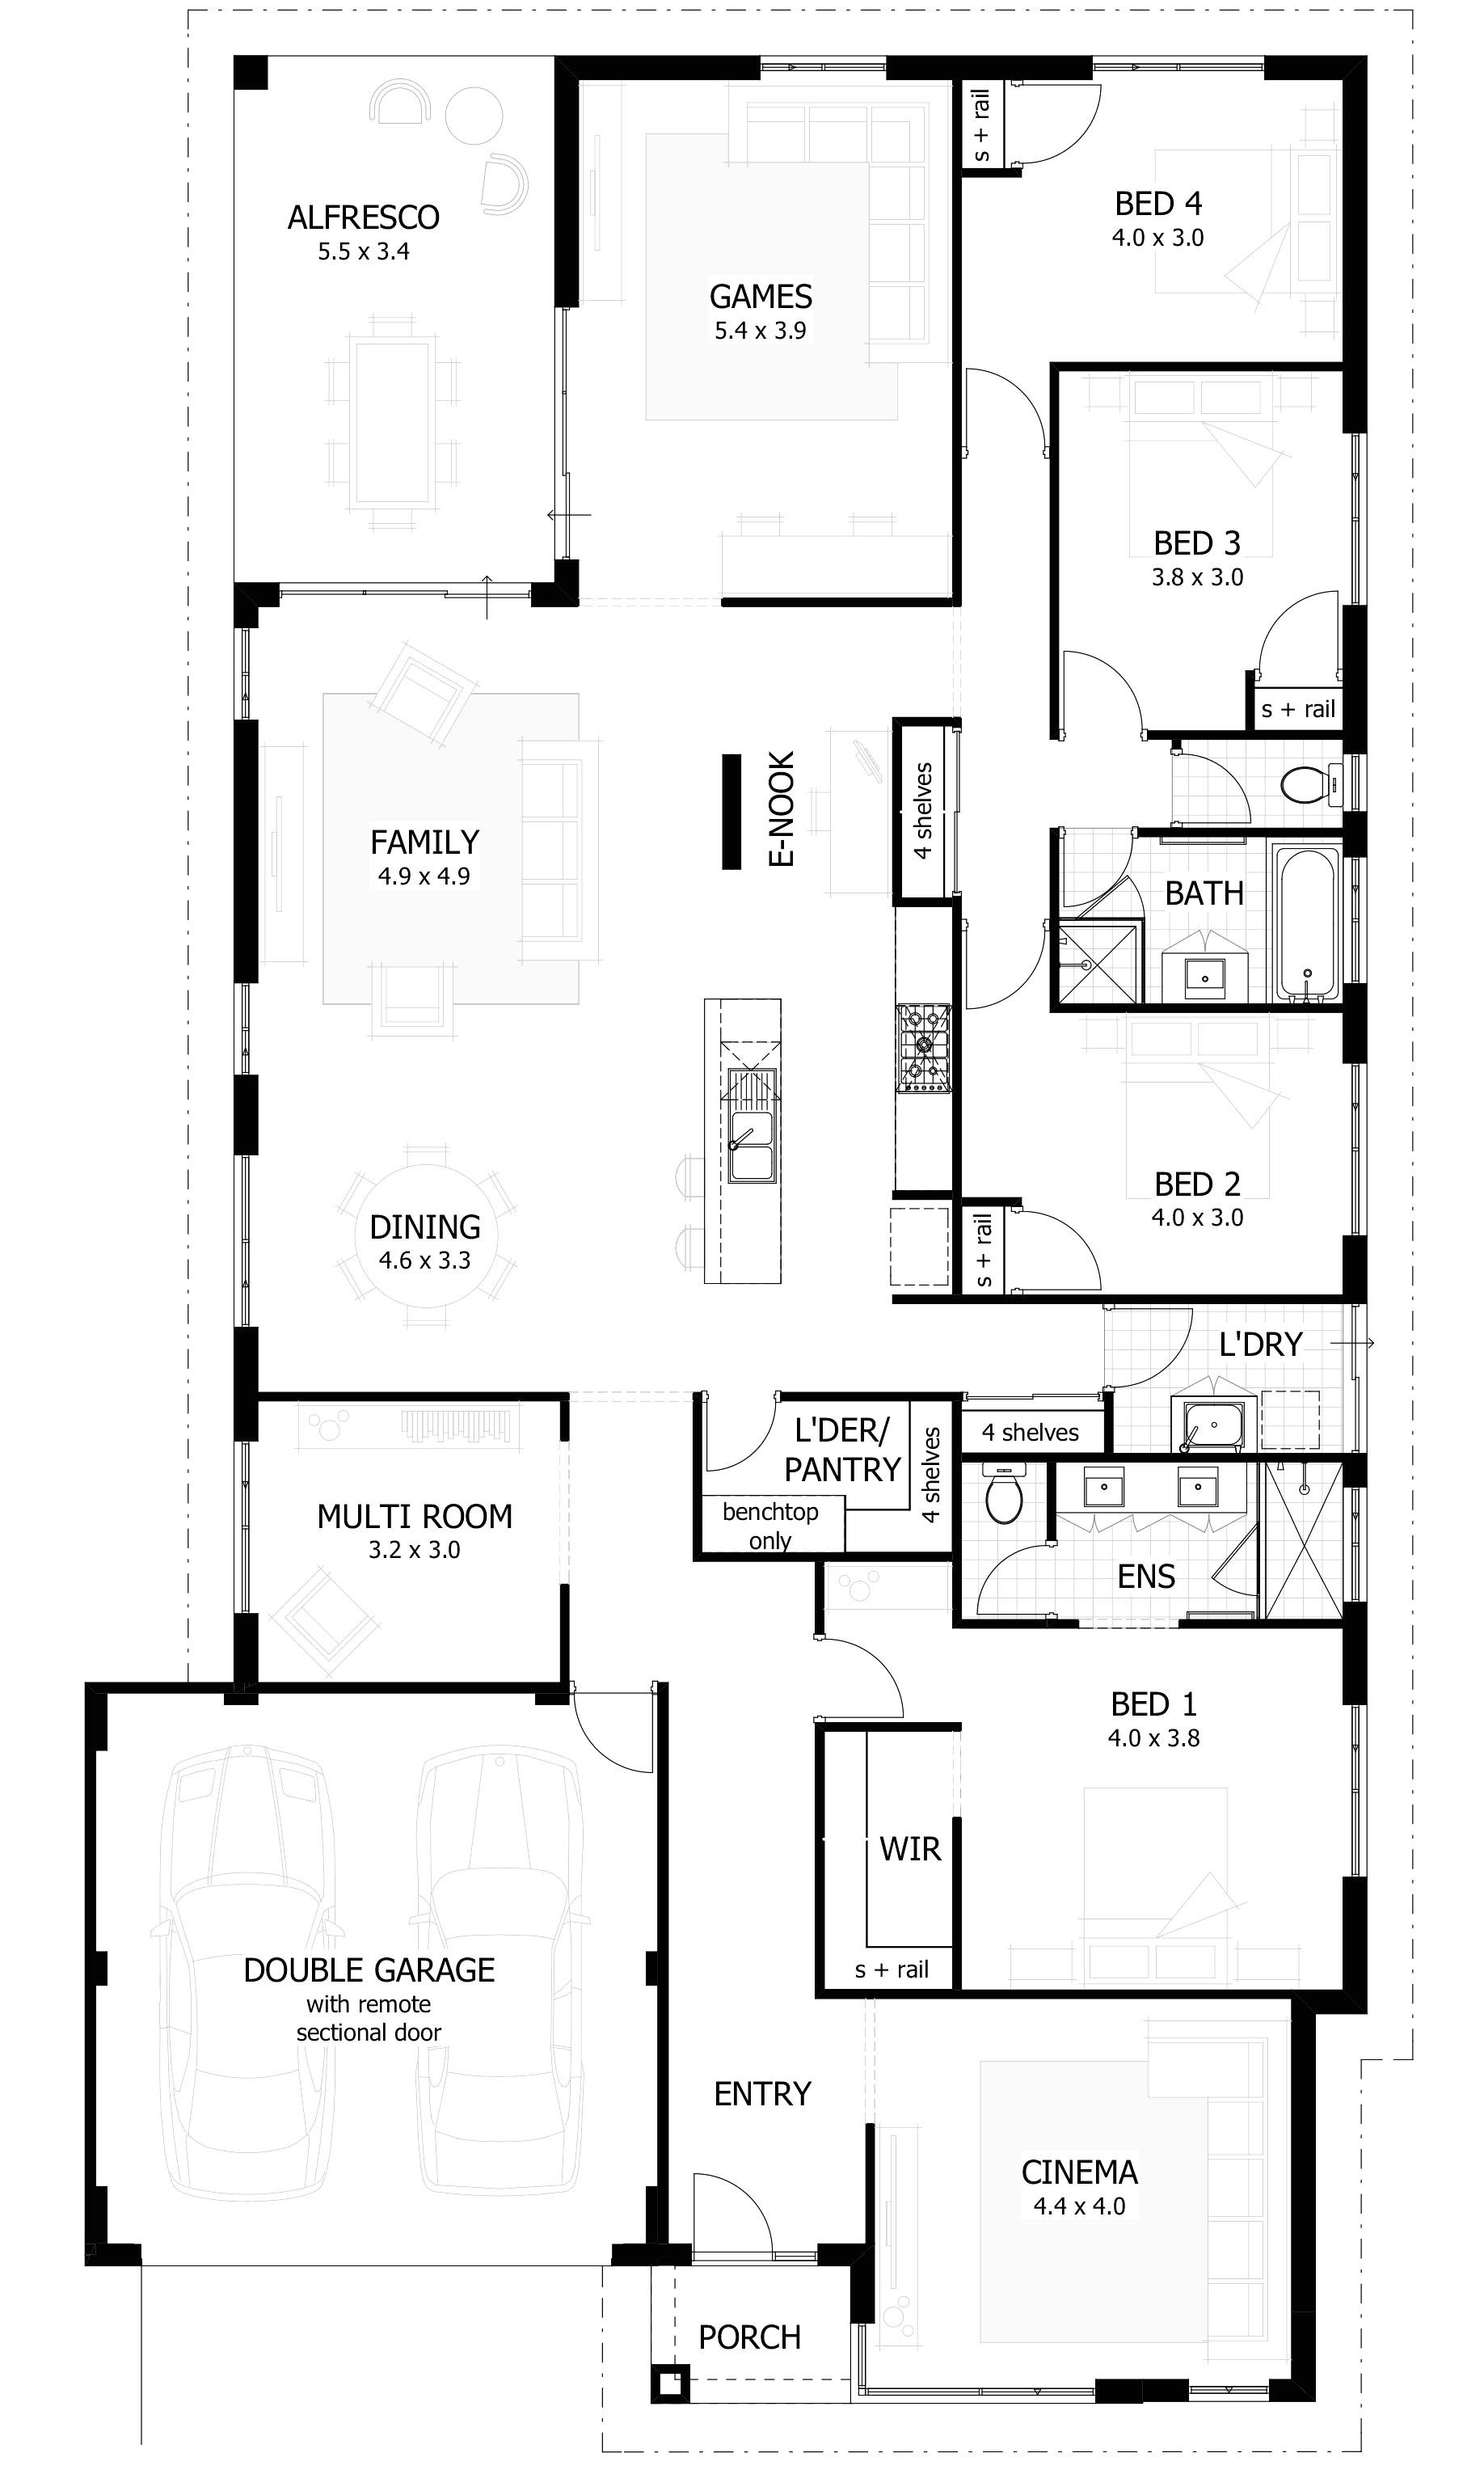 modular home floor plans florida unique triple wide manufactured homes floor plans 50 best champion modular